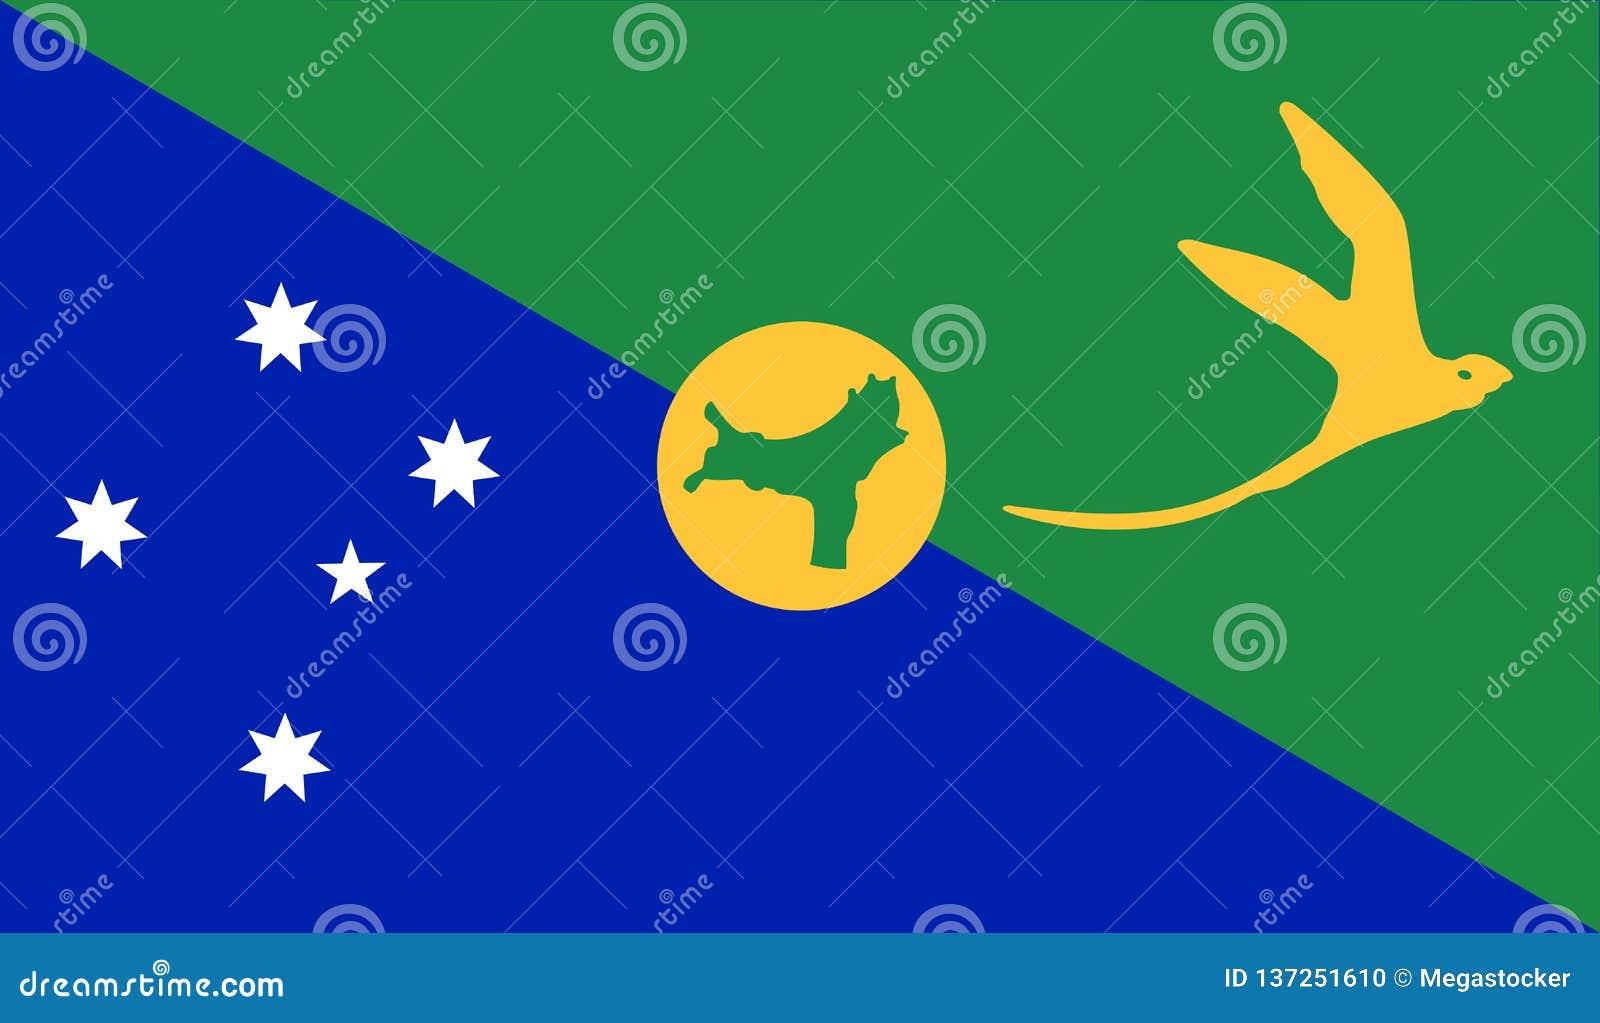 Christmas Island Flag stock vector. Illustration of republic - 137251610